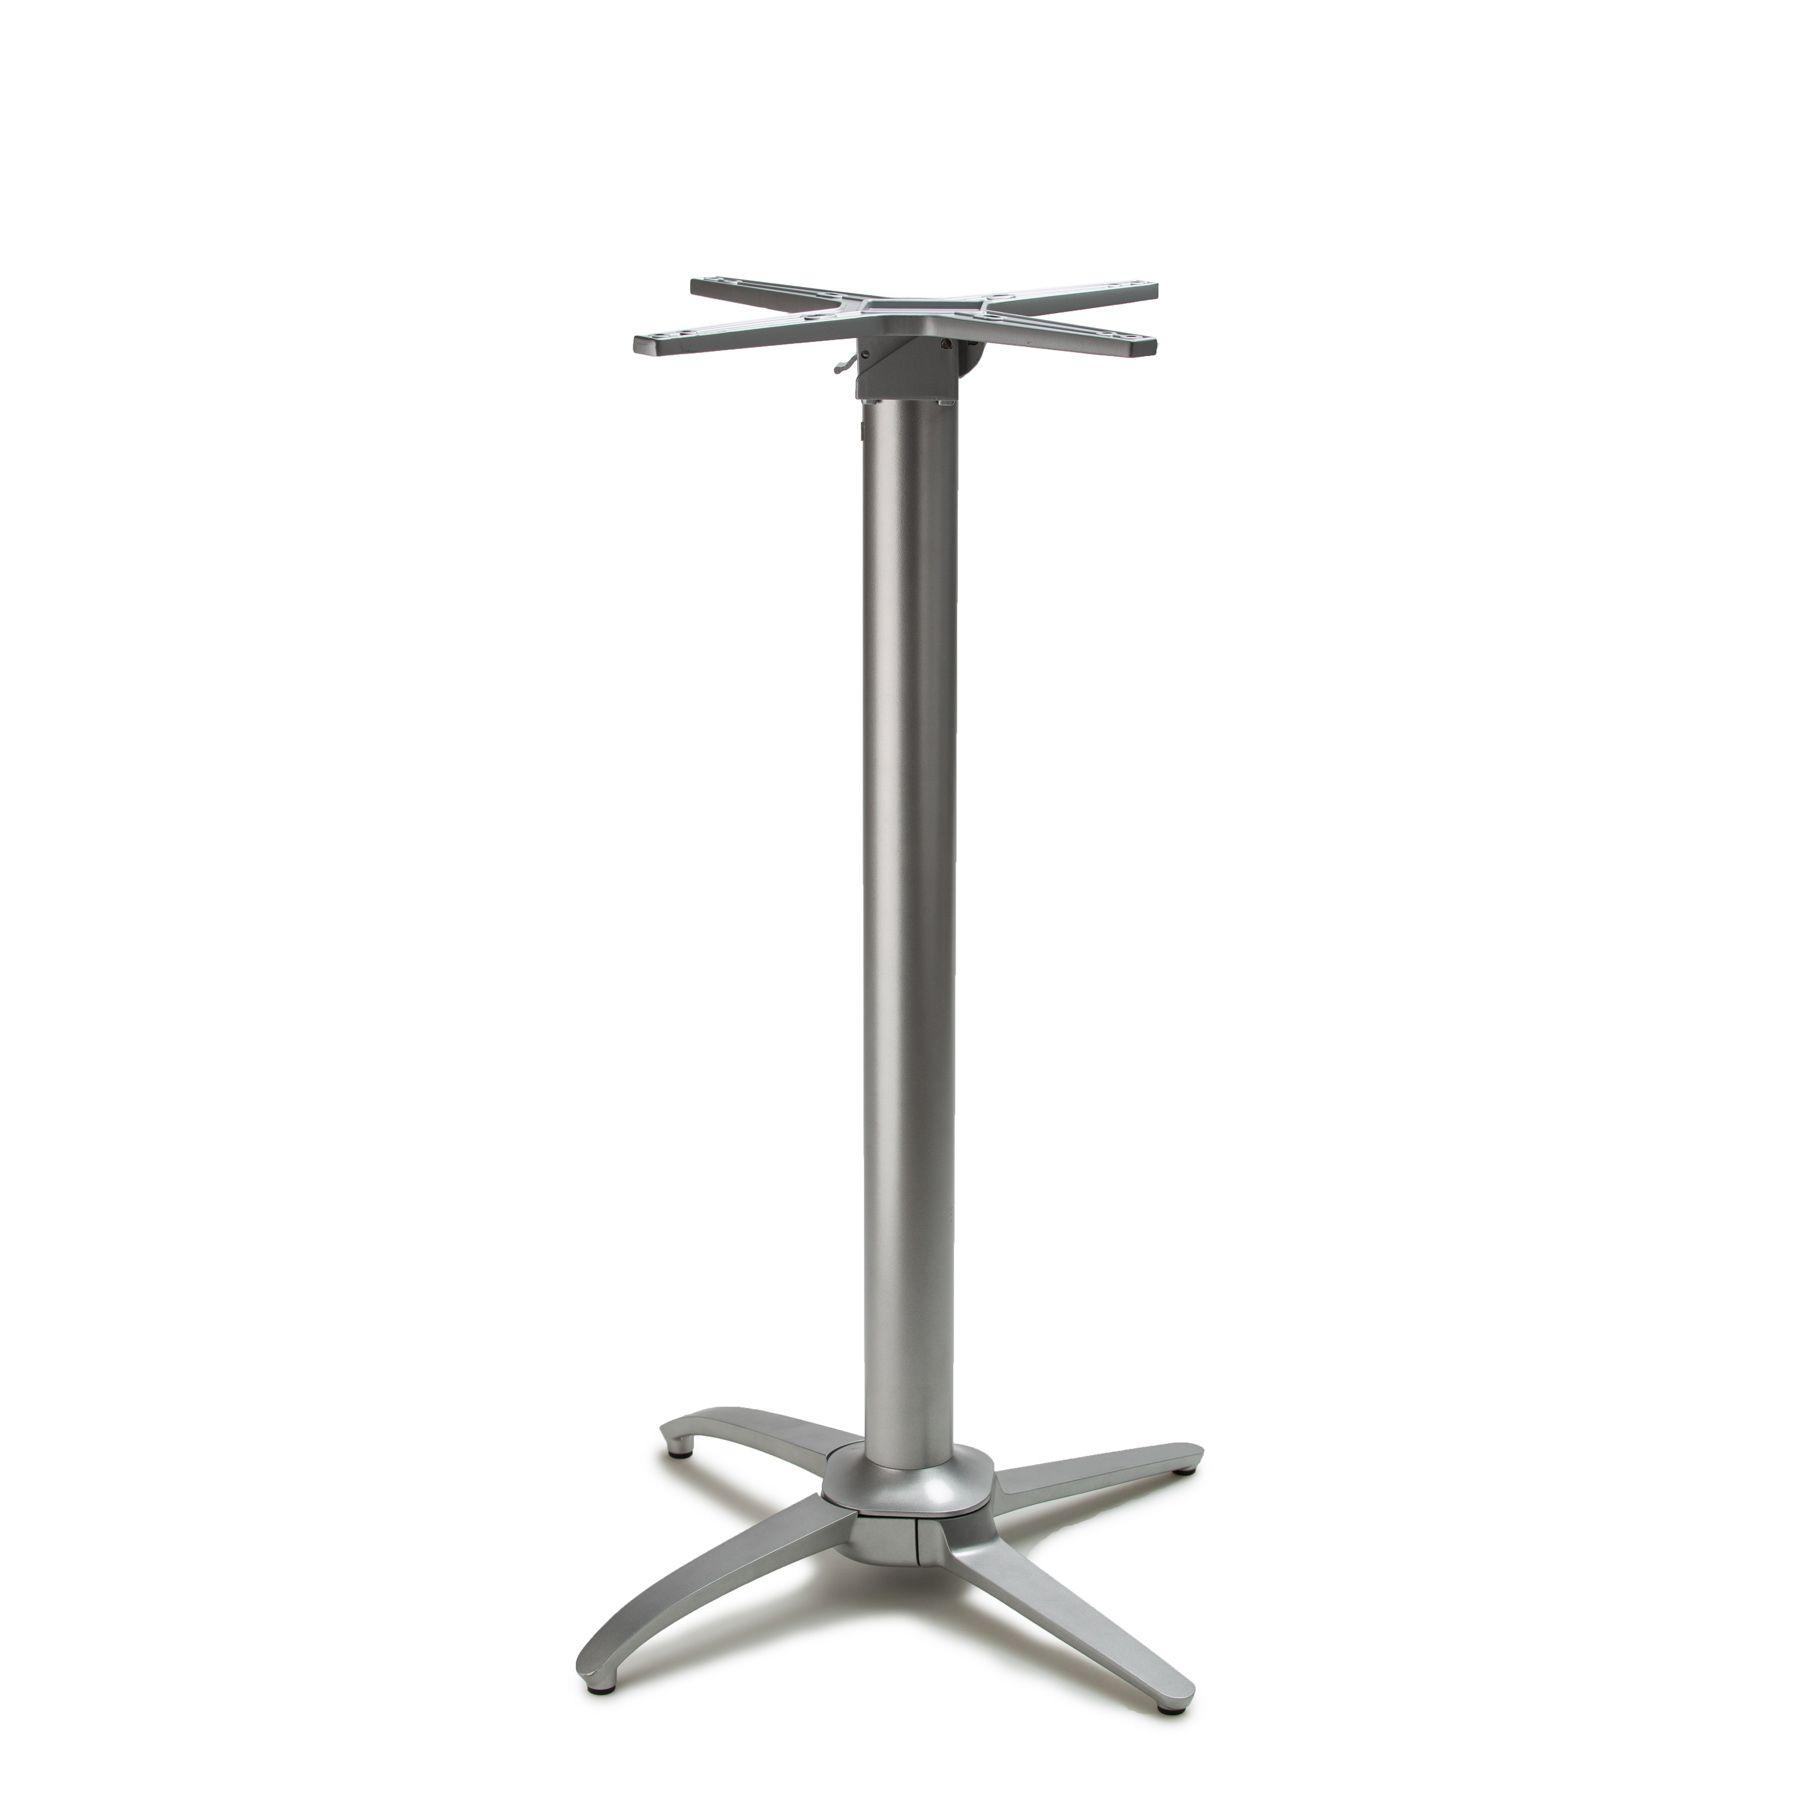 No-Rock Terrace Metallic Silver - Self Stabilizing Table Base